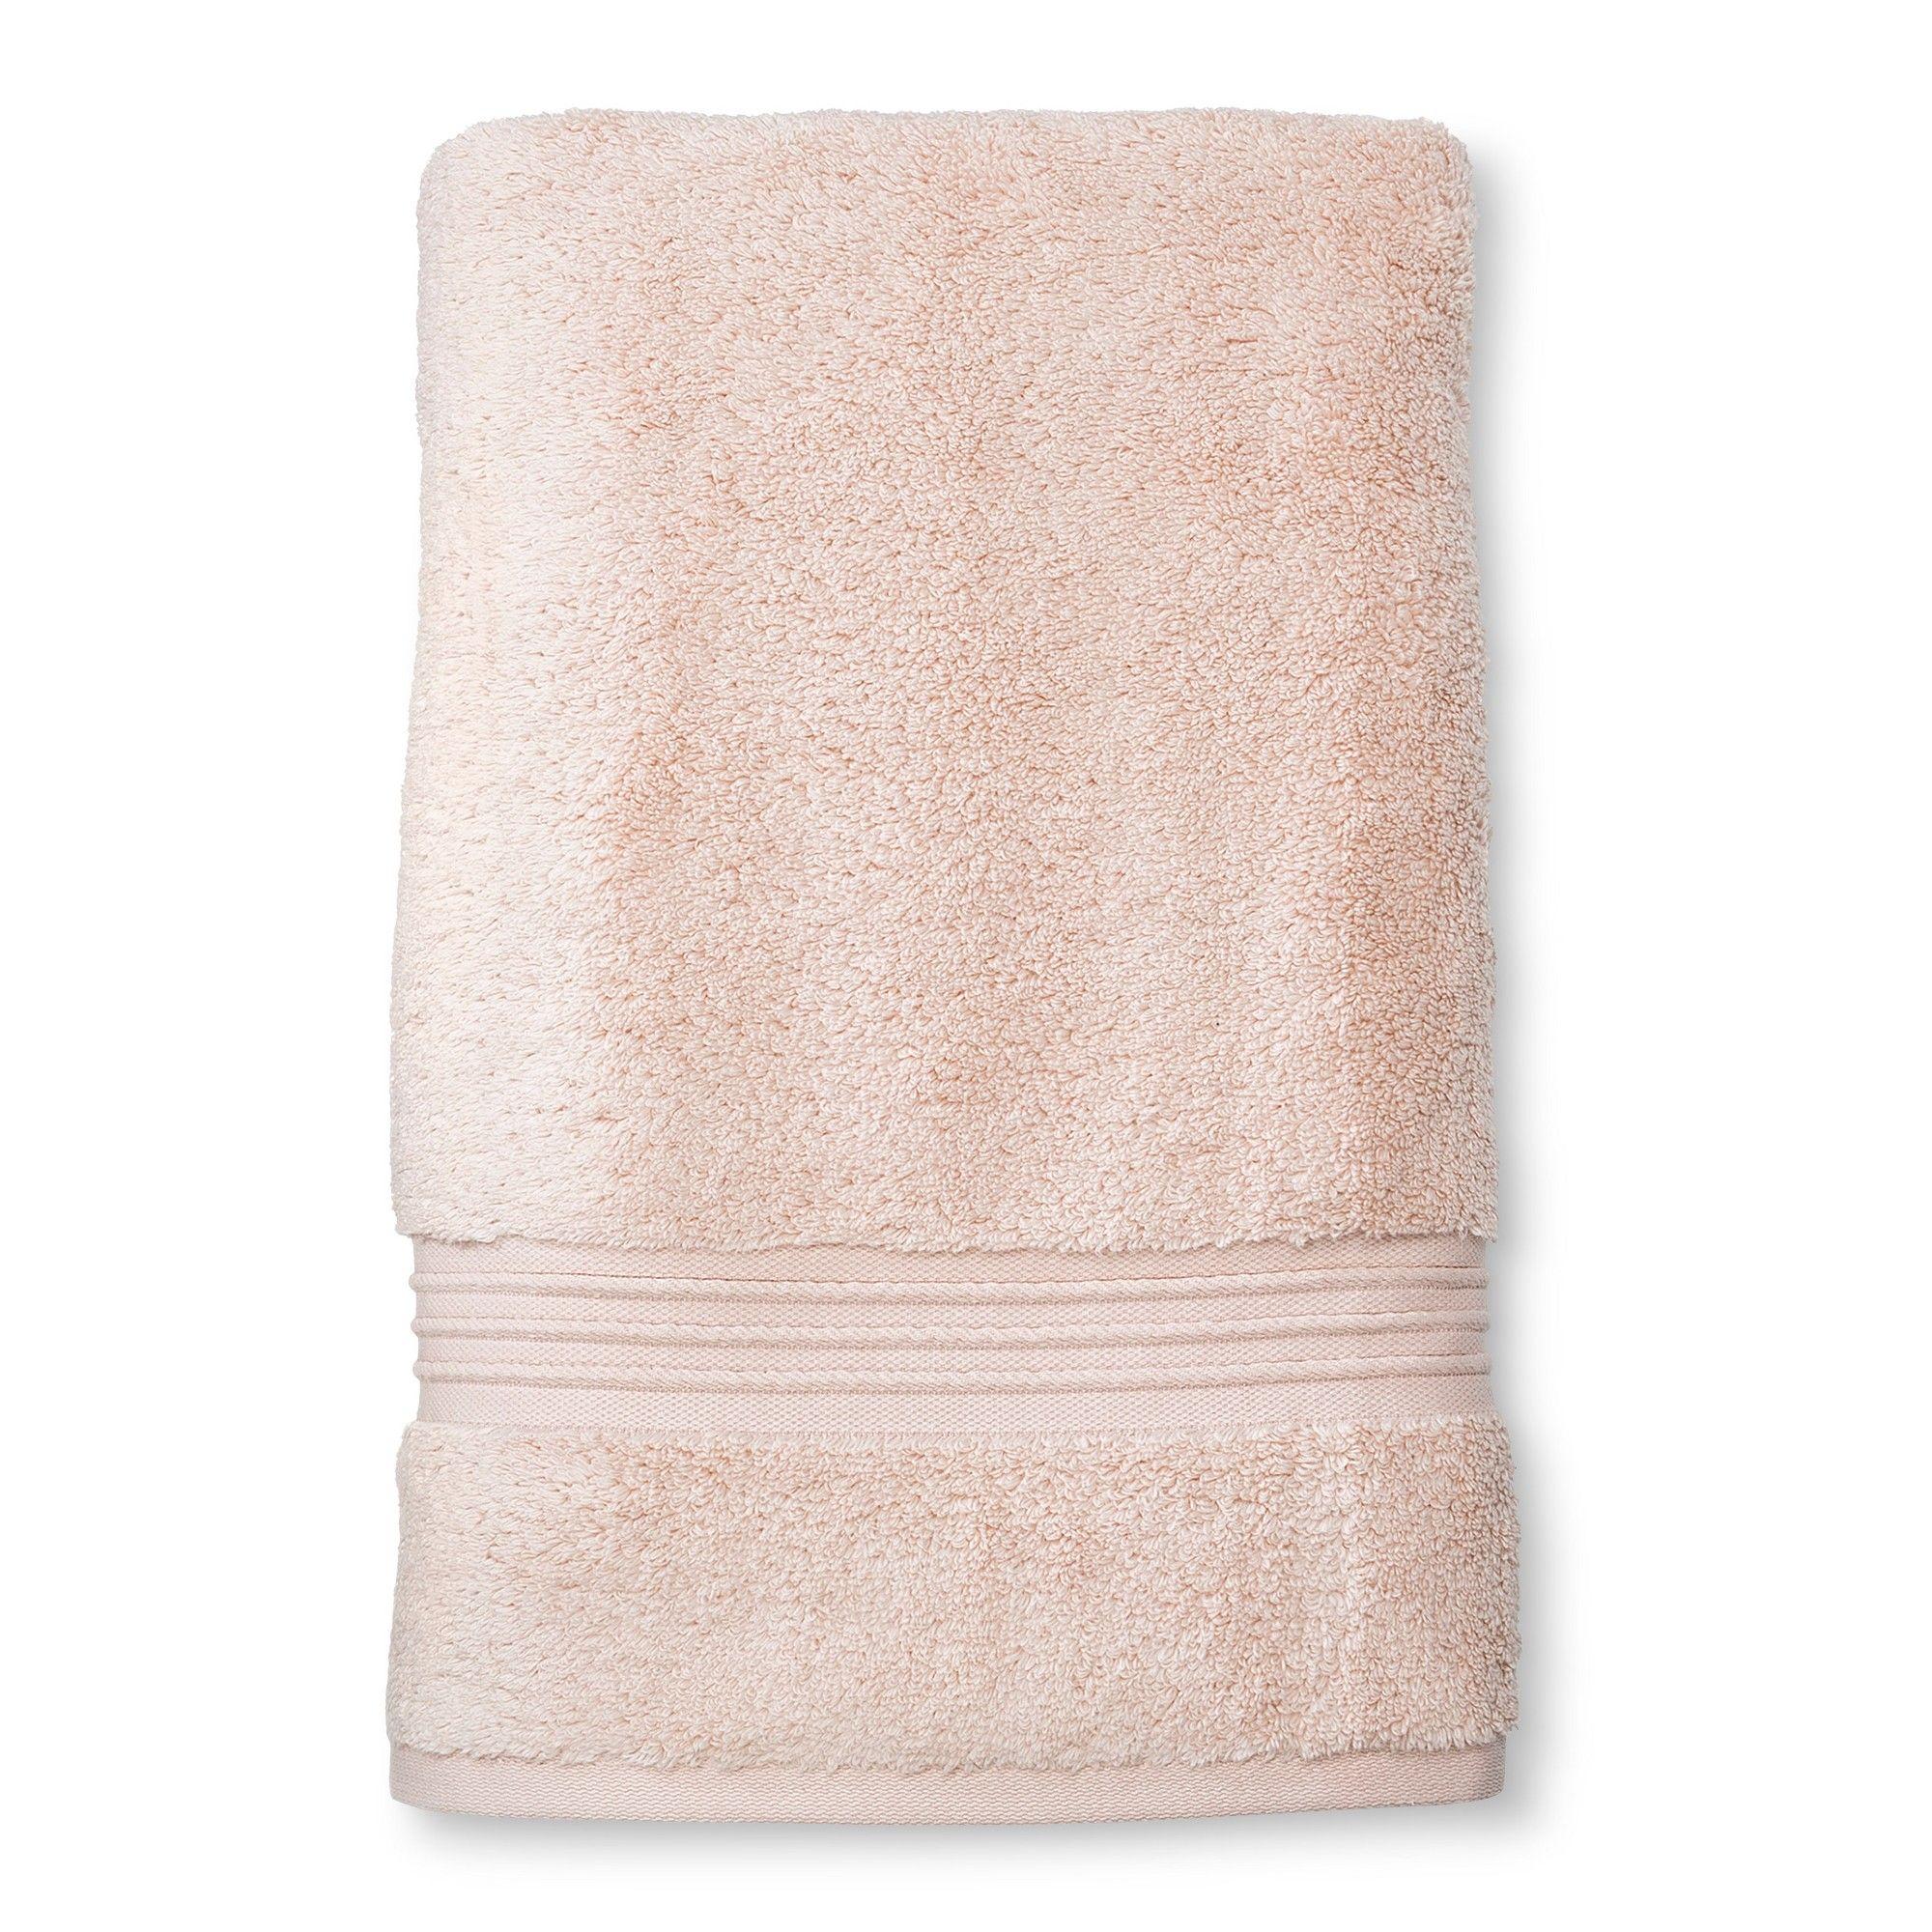 Microcotton Spa Bath Sheet Peach Stripe Fieldcrest Spa Bath